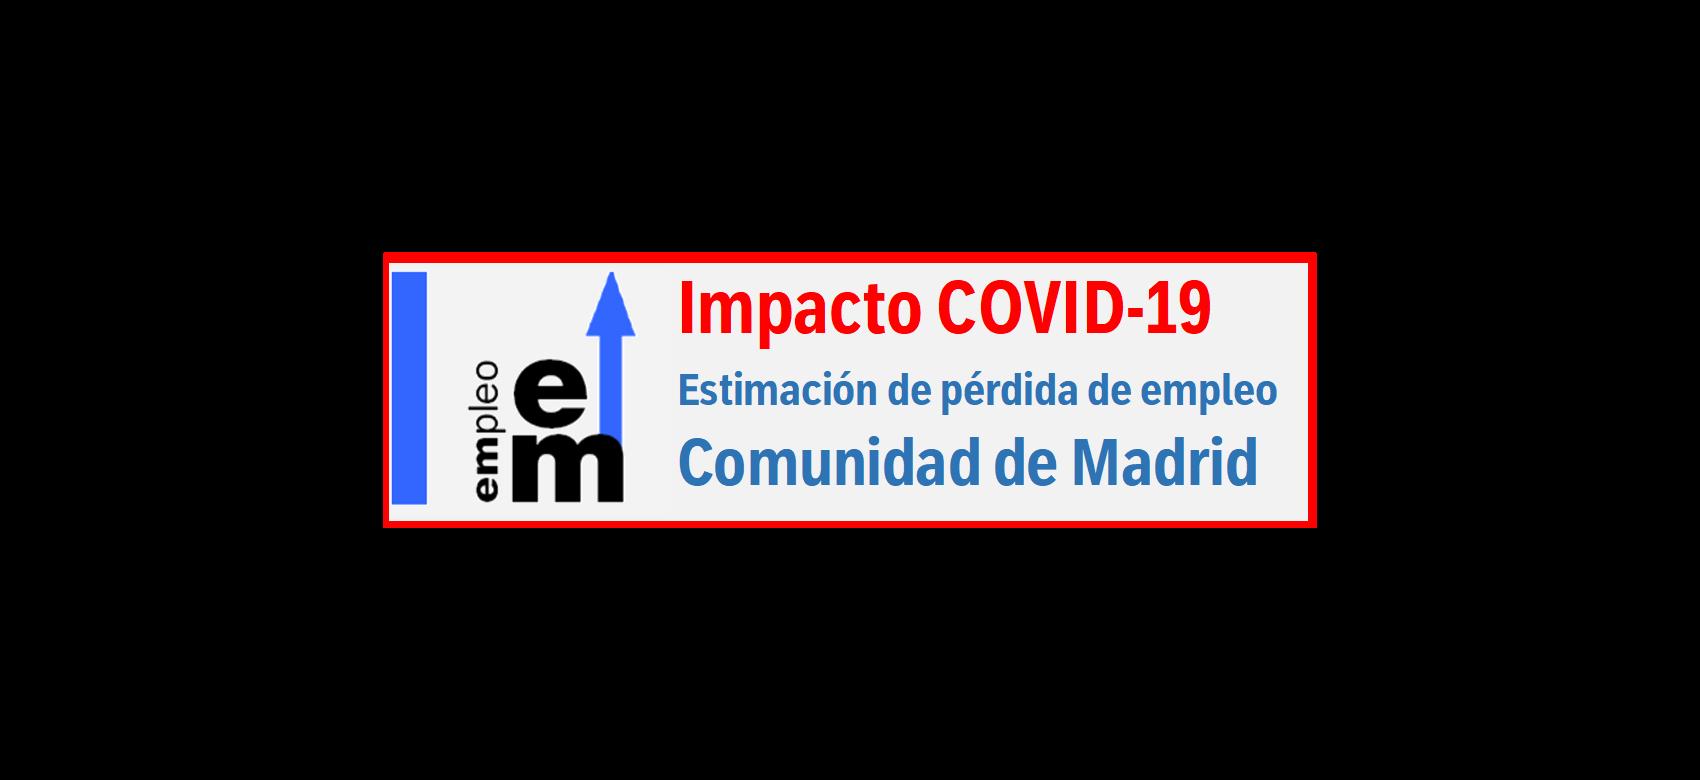 Texto Impacto COVID-19 perdida de empleo